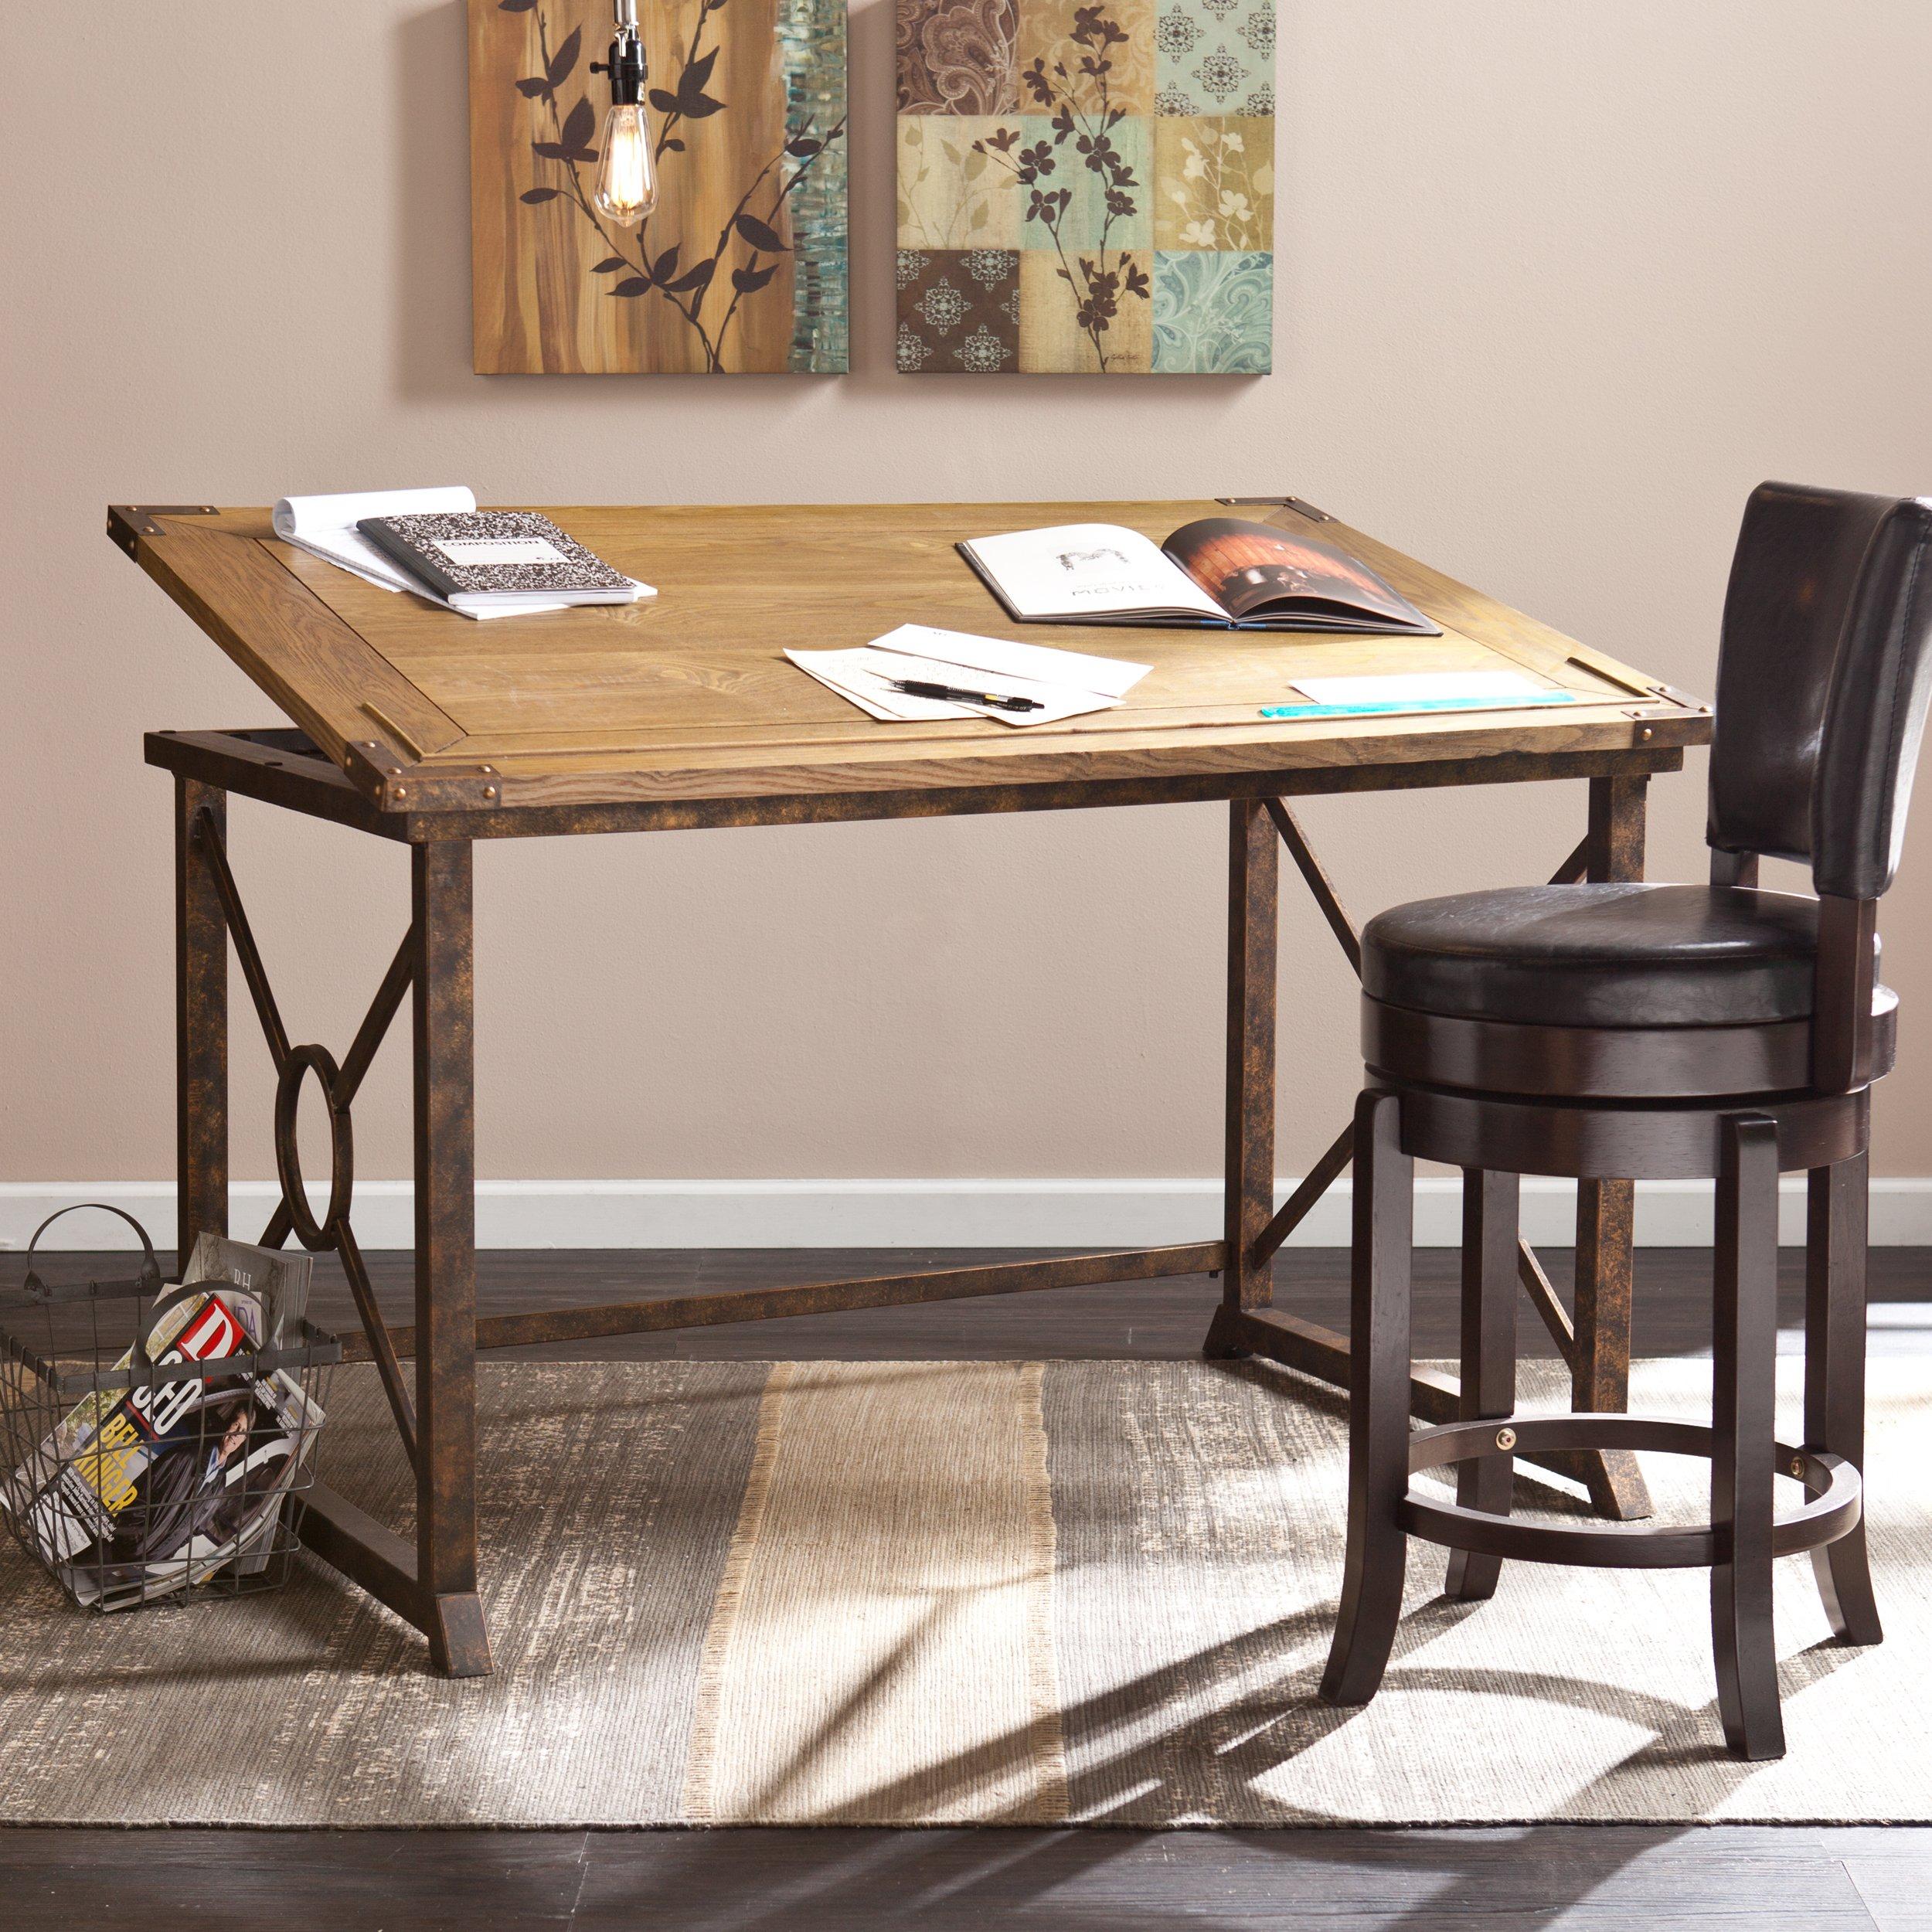 Southern Enterprises Knightley Tilt Top Drafting Table - 51.5'' Wide - Oak Wood Finish w/Antique Brass